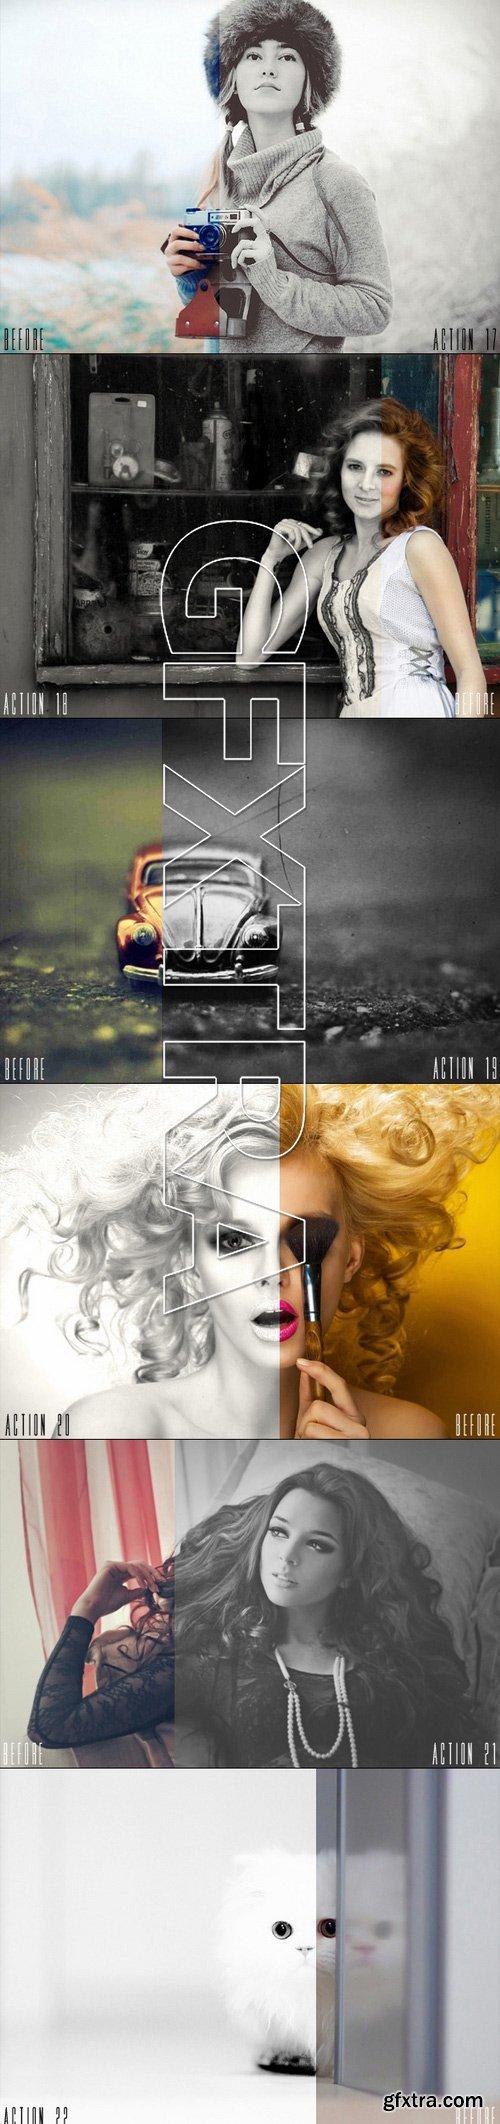 25 Black & White Photoshop Actions 11527320